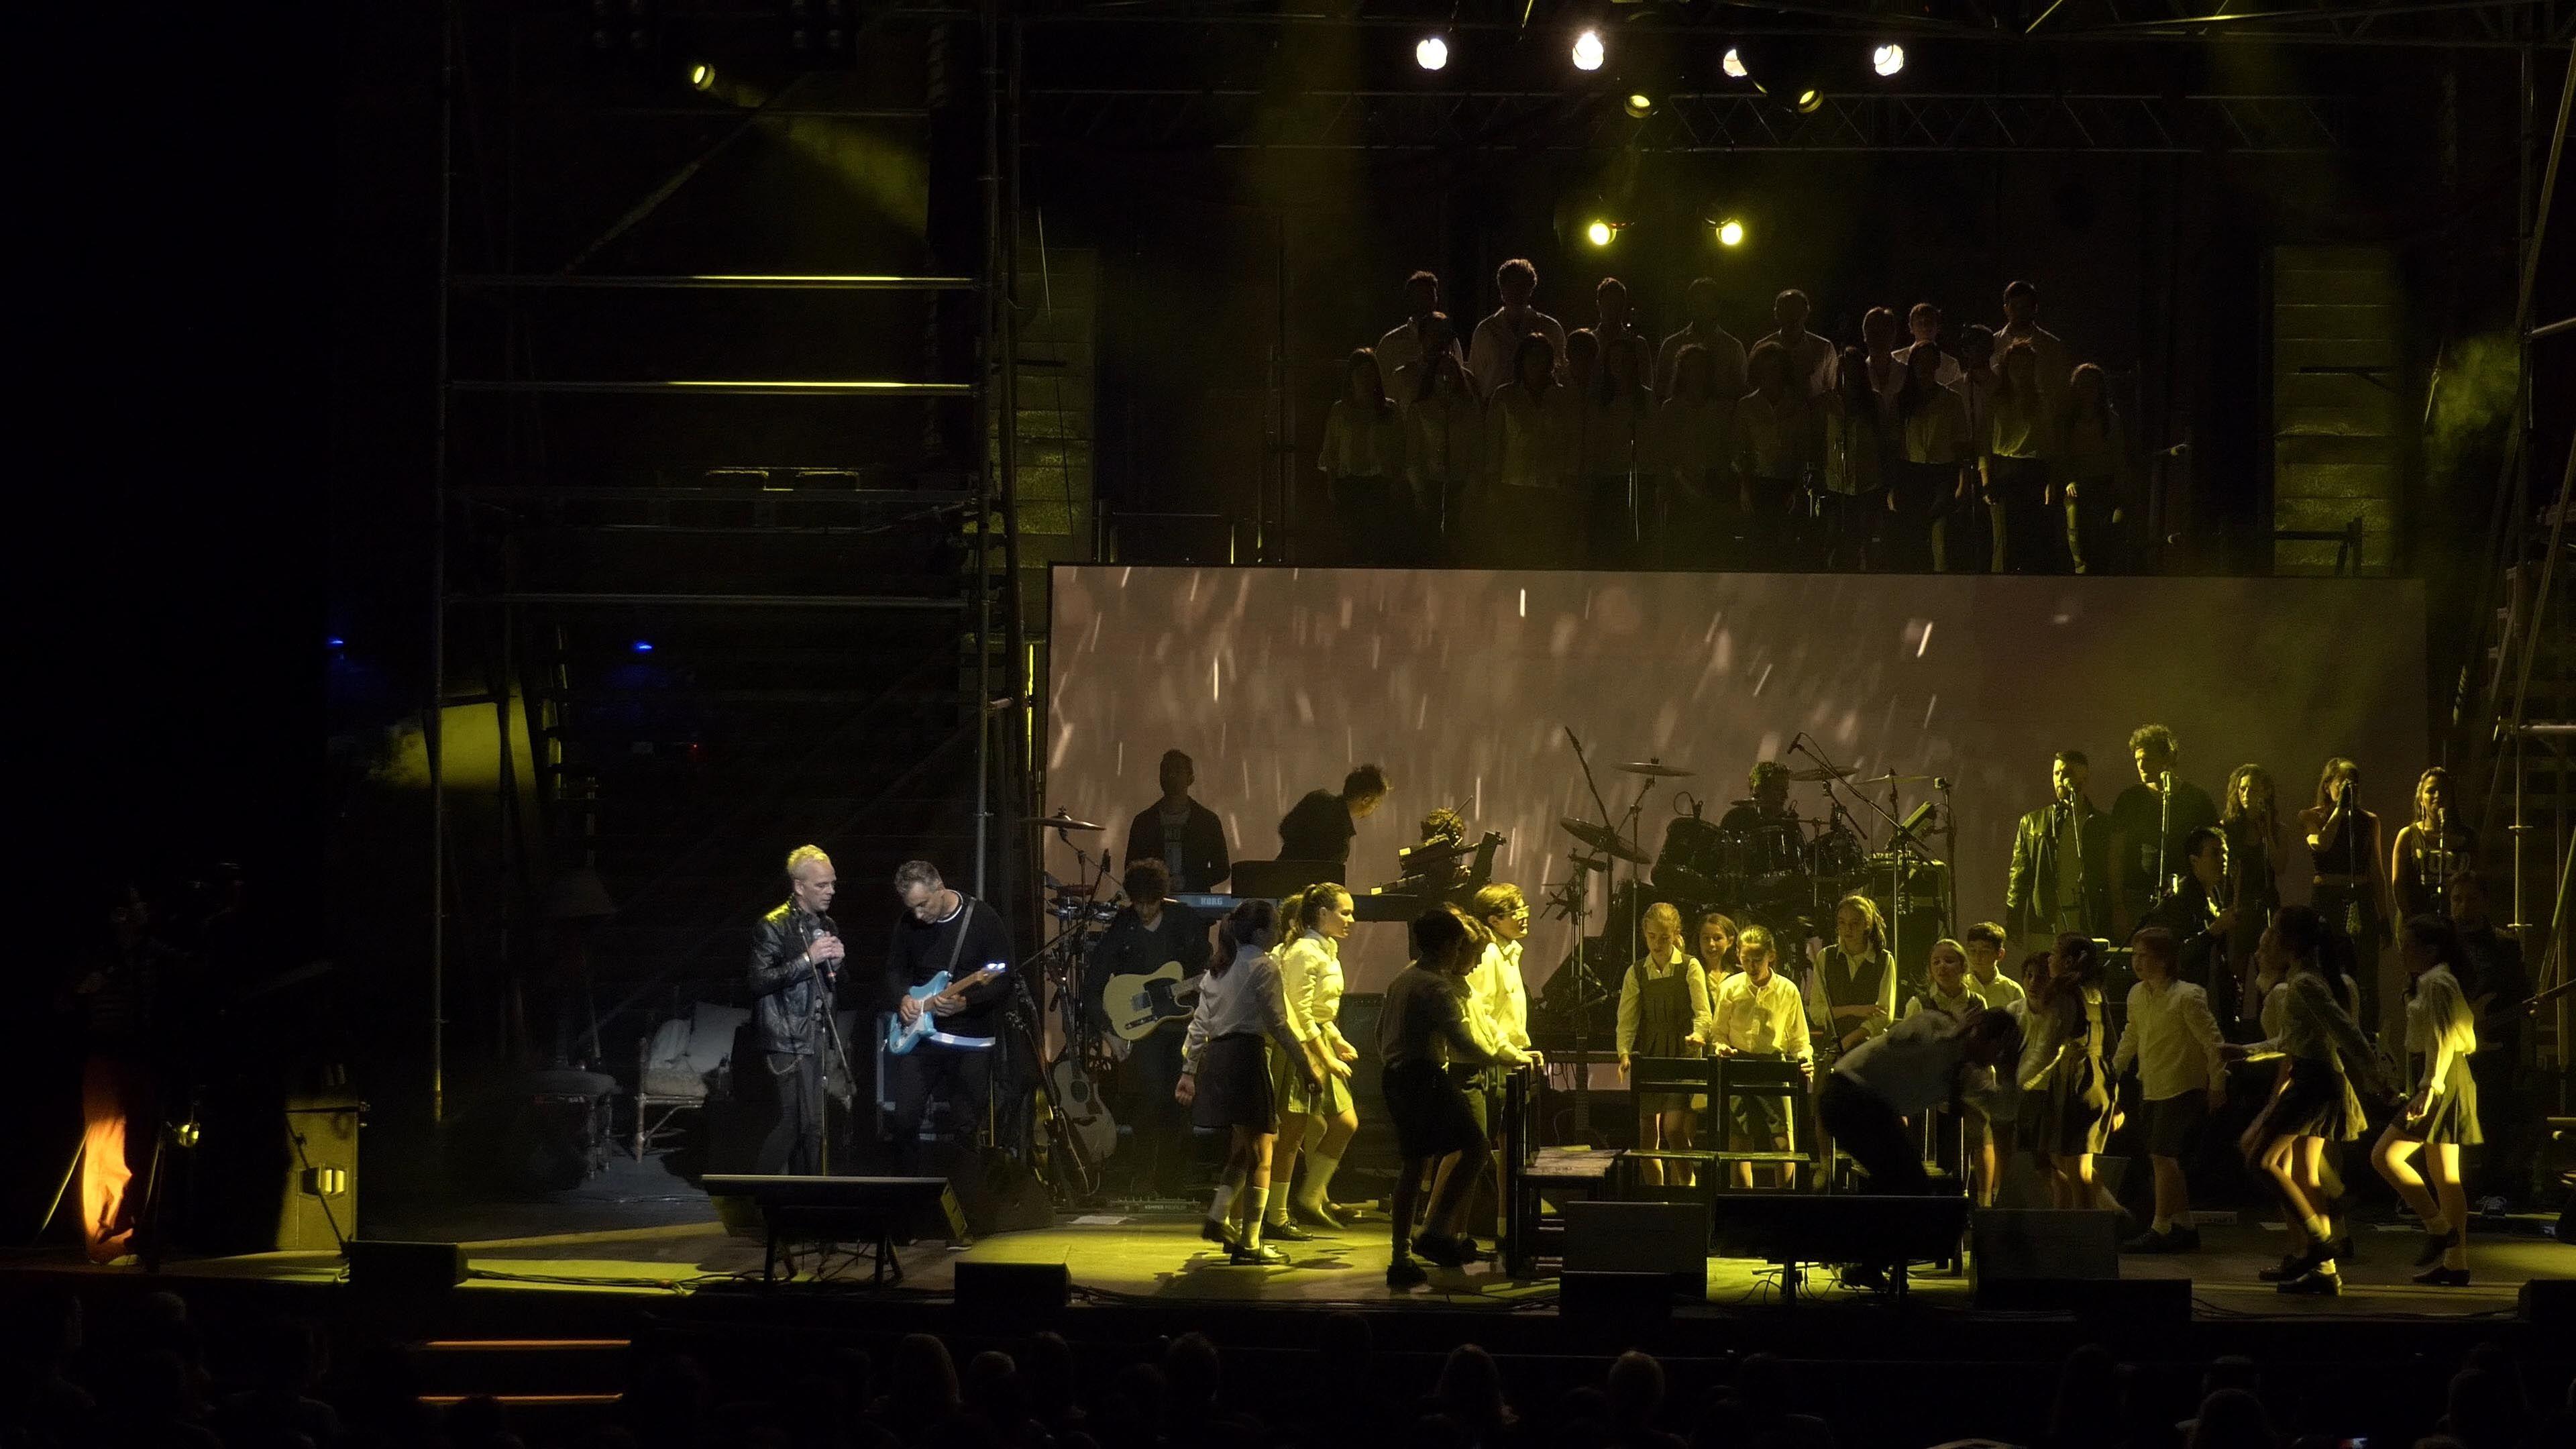 El espíritu de Pink Floyd llega a la avenida Corrientes